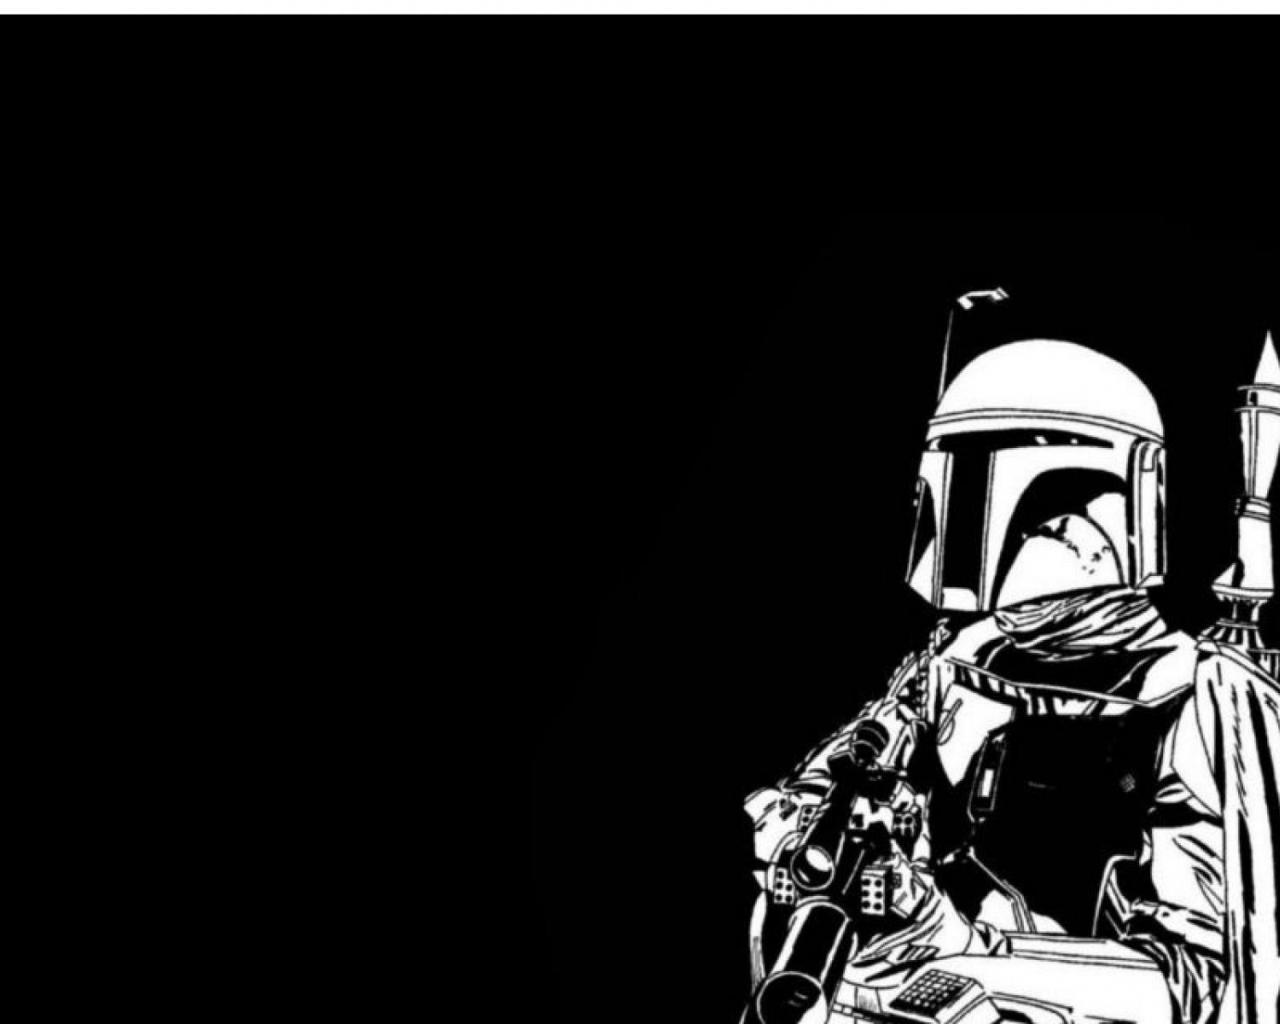 Free Download Boba Fett Star Wars Black Green White Wallpaper